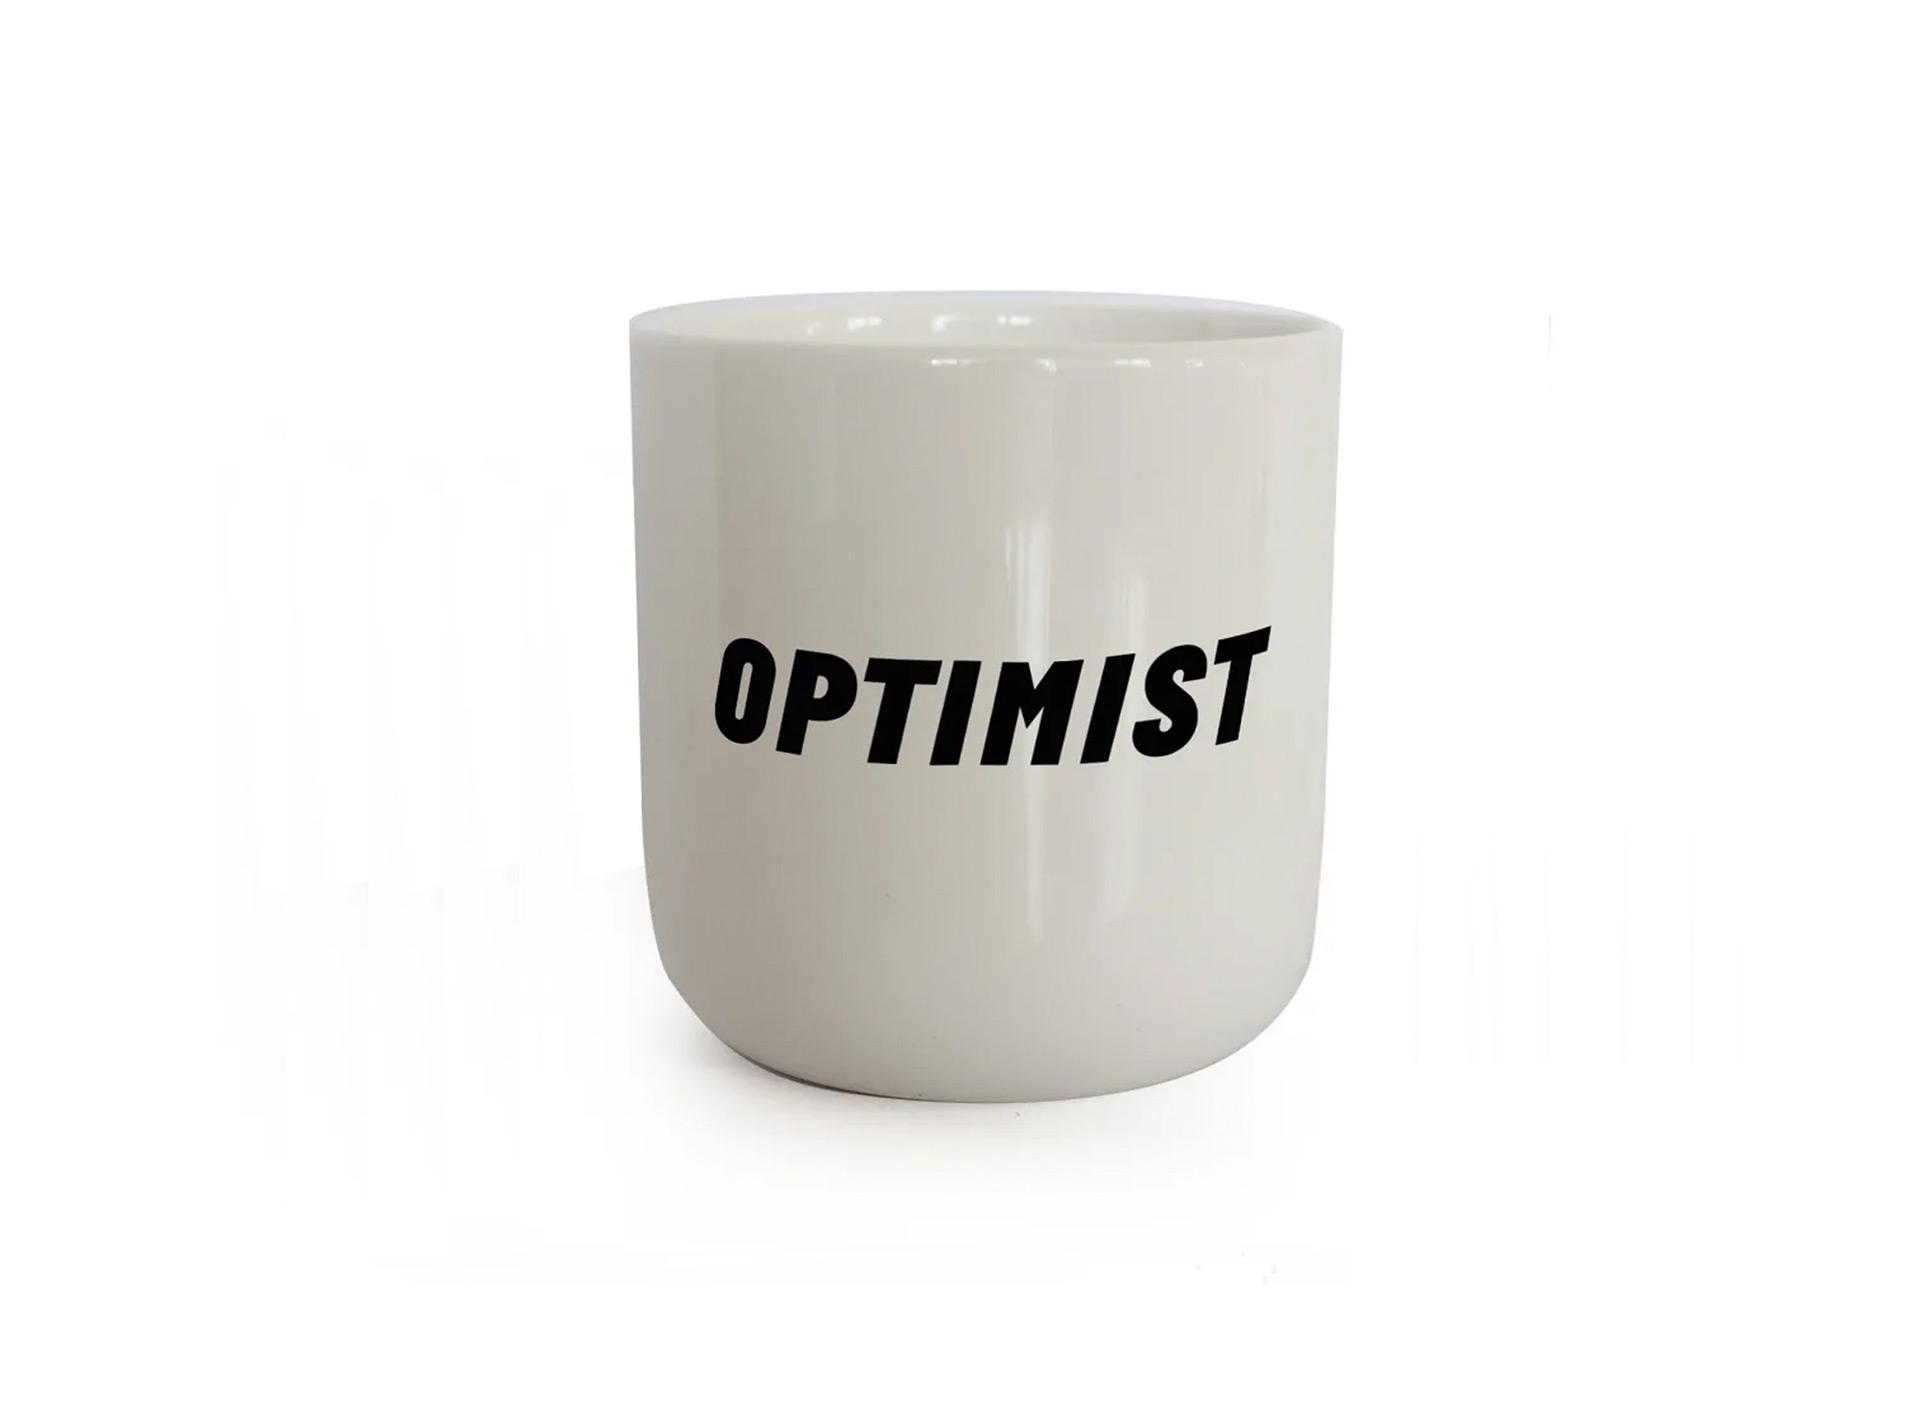 Porzellanbecher - Optimist